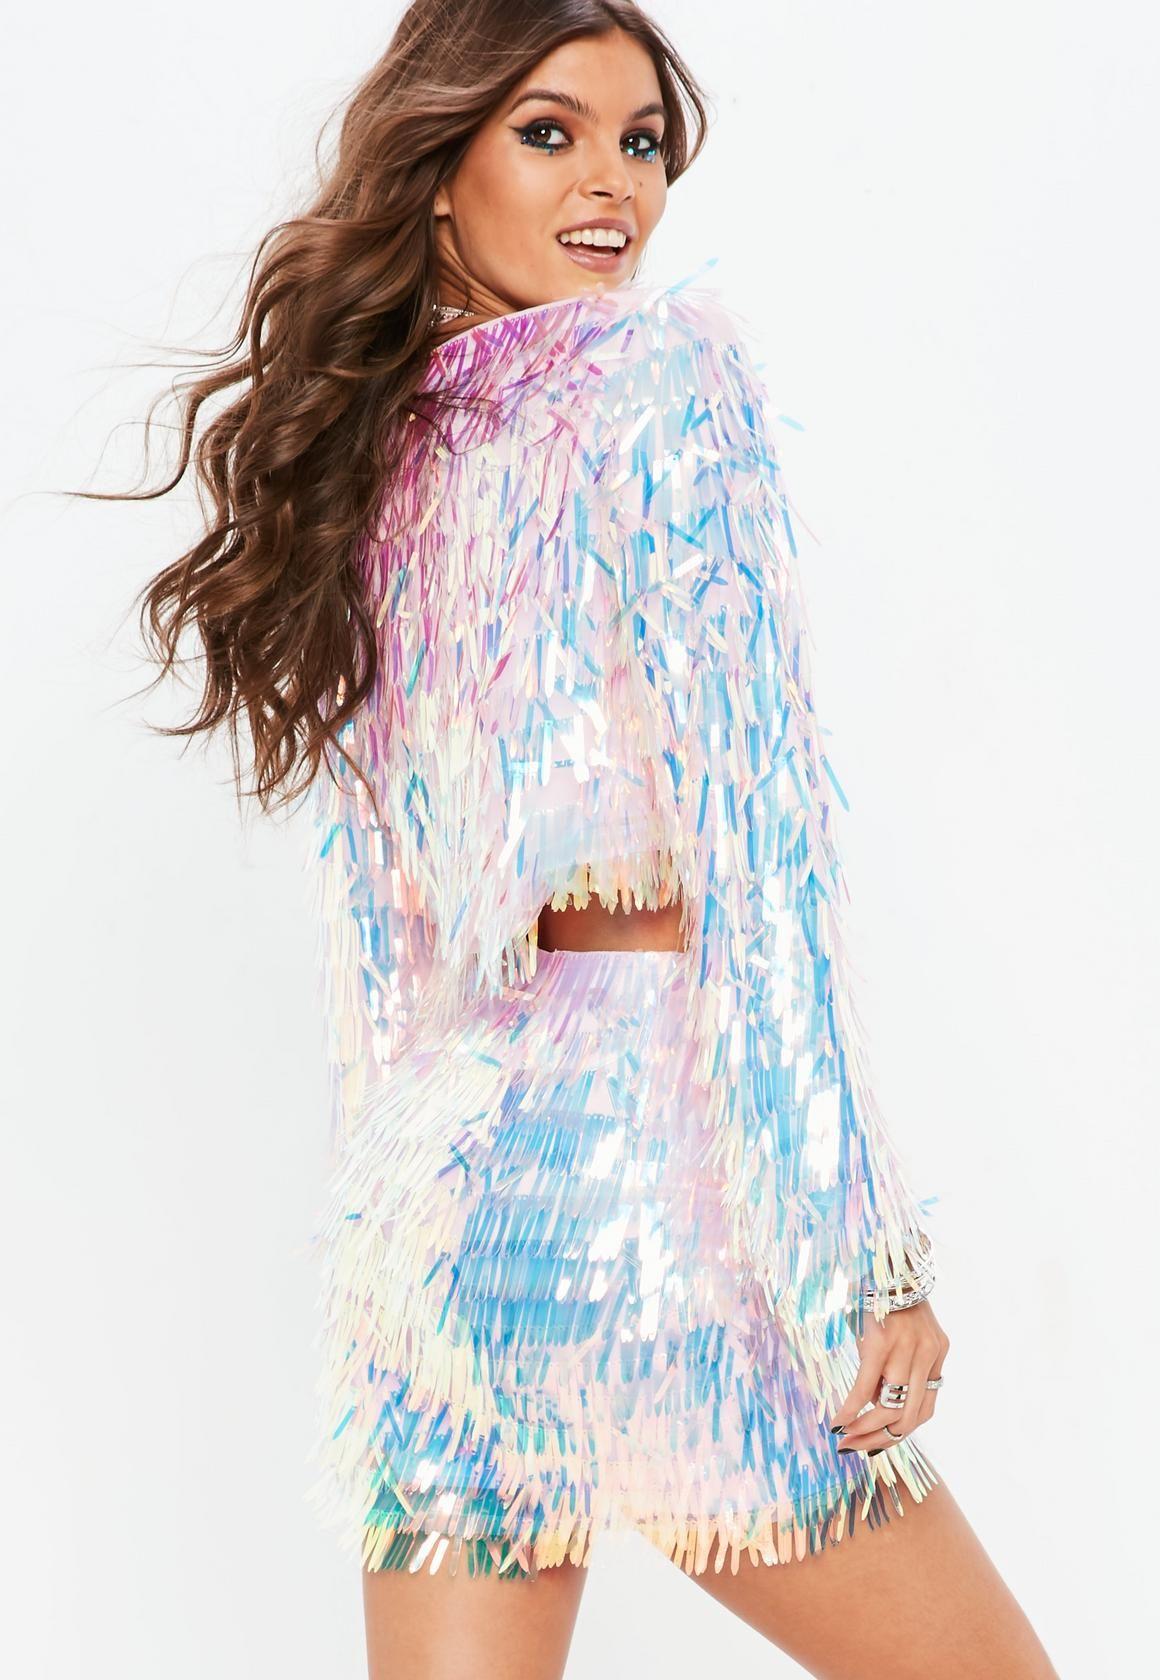 5f94454bd7b5e Pink Iridescent Sequin Jacket